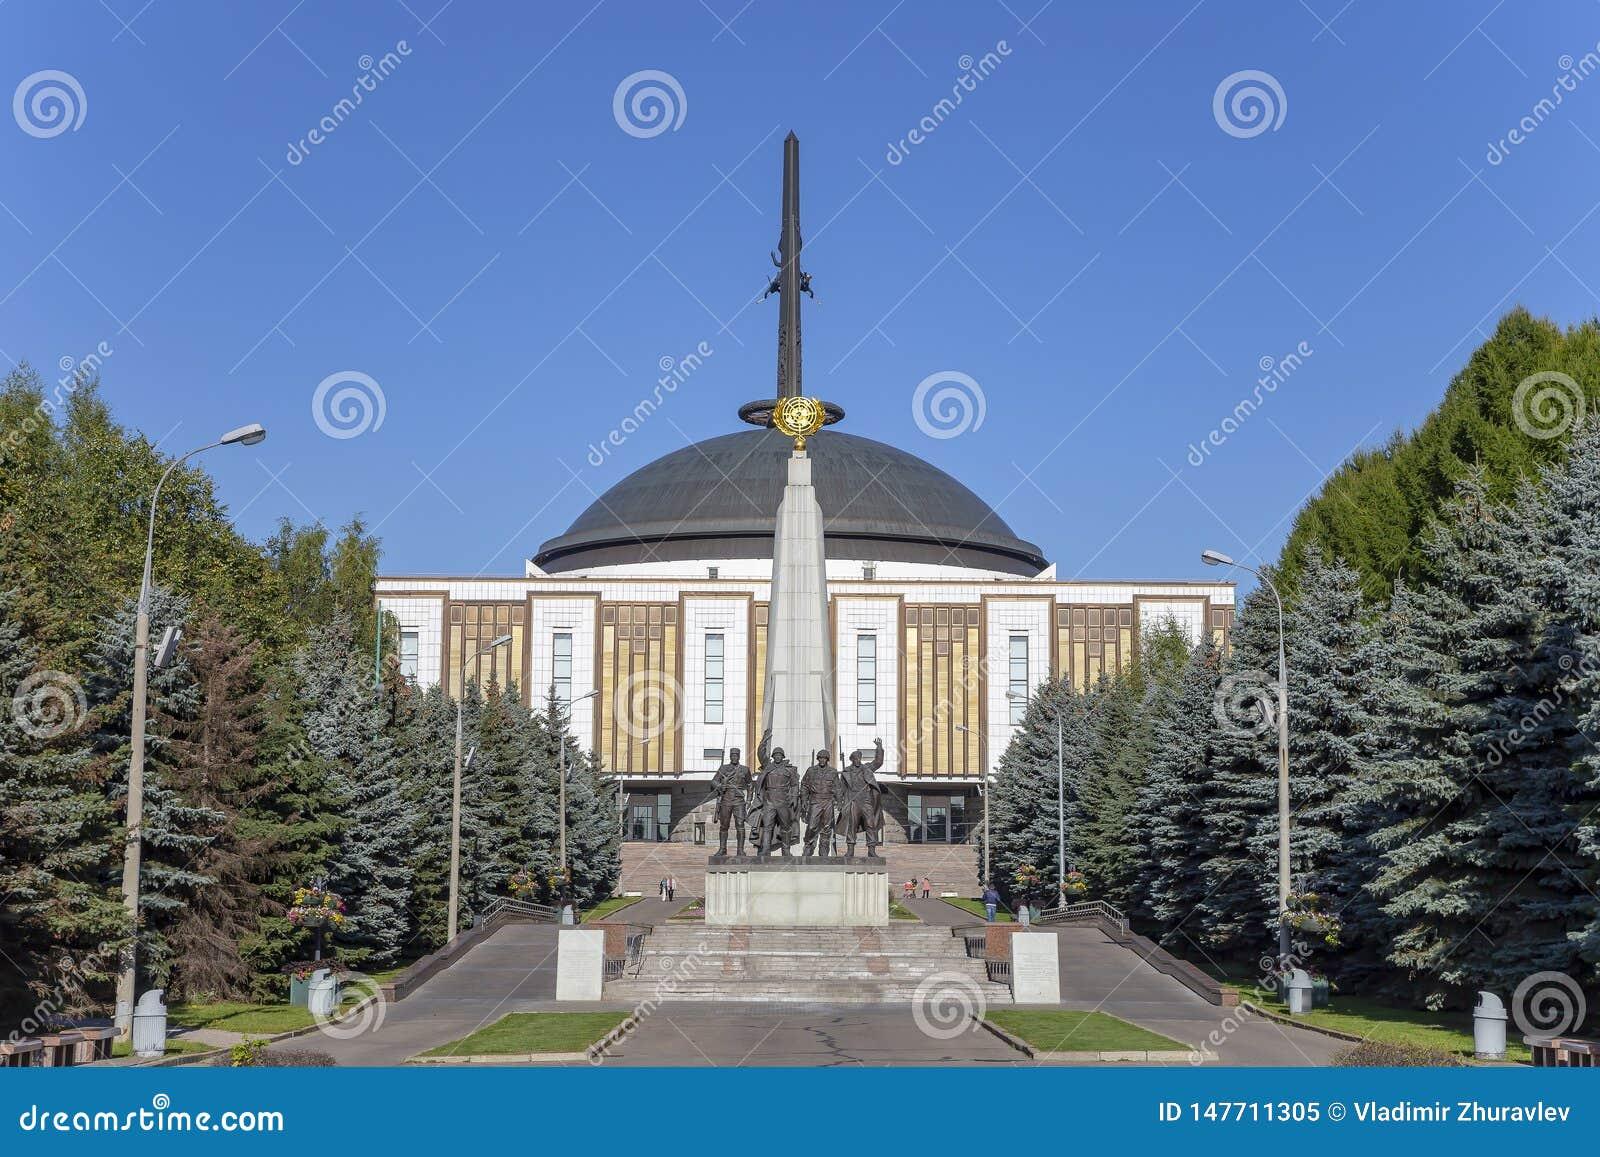 Monument aan landen van anti-Hitler coalitie, Steegaanhanger in Victory Park op Poklonnaya-heuvel, Moskou, Rusland